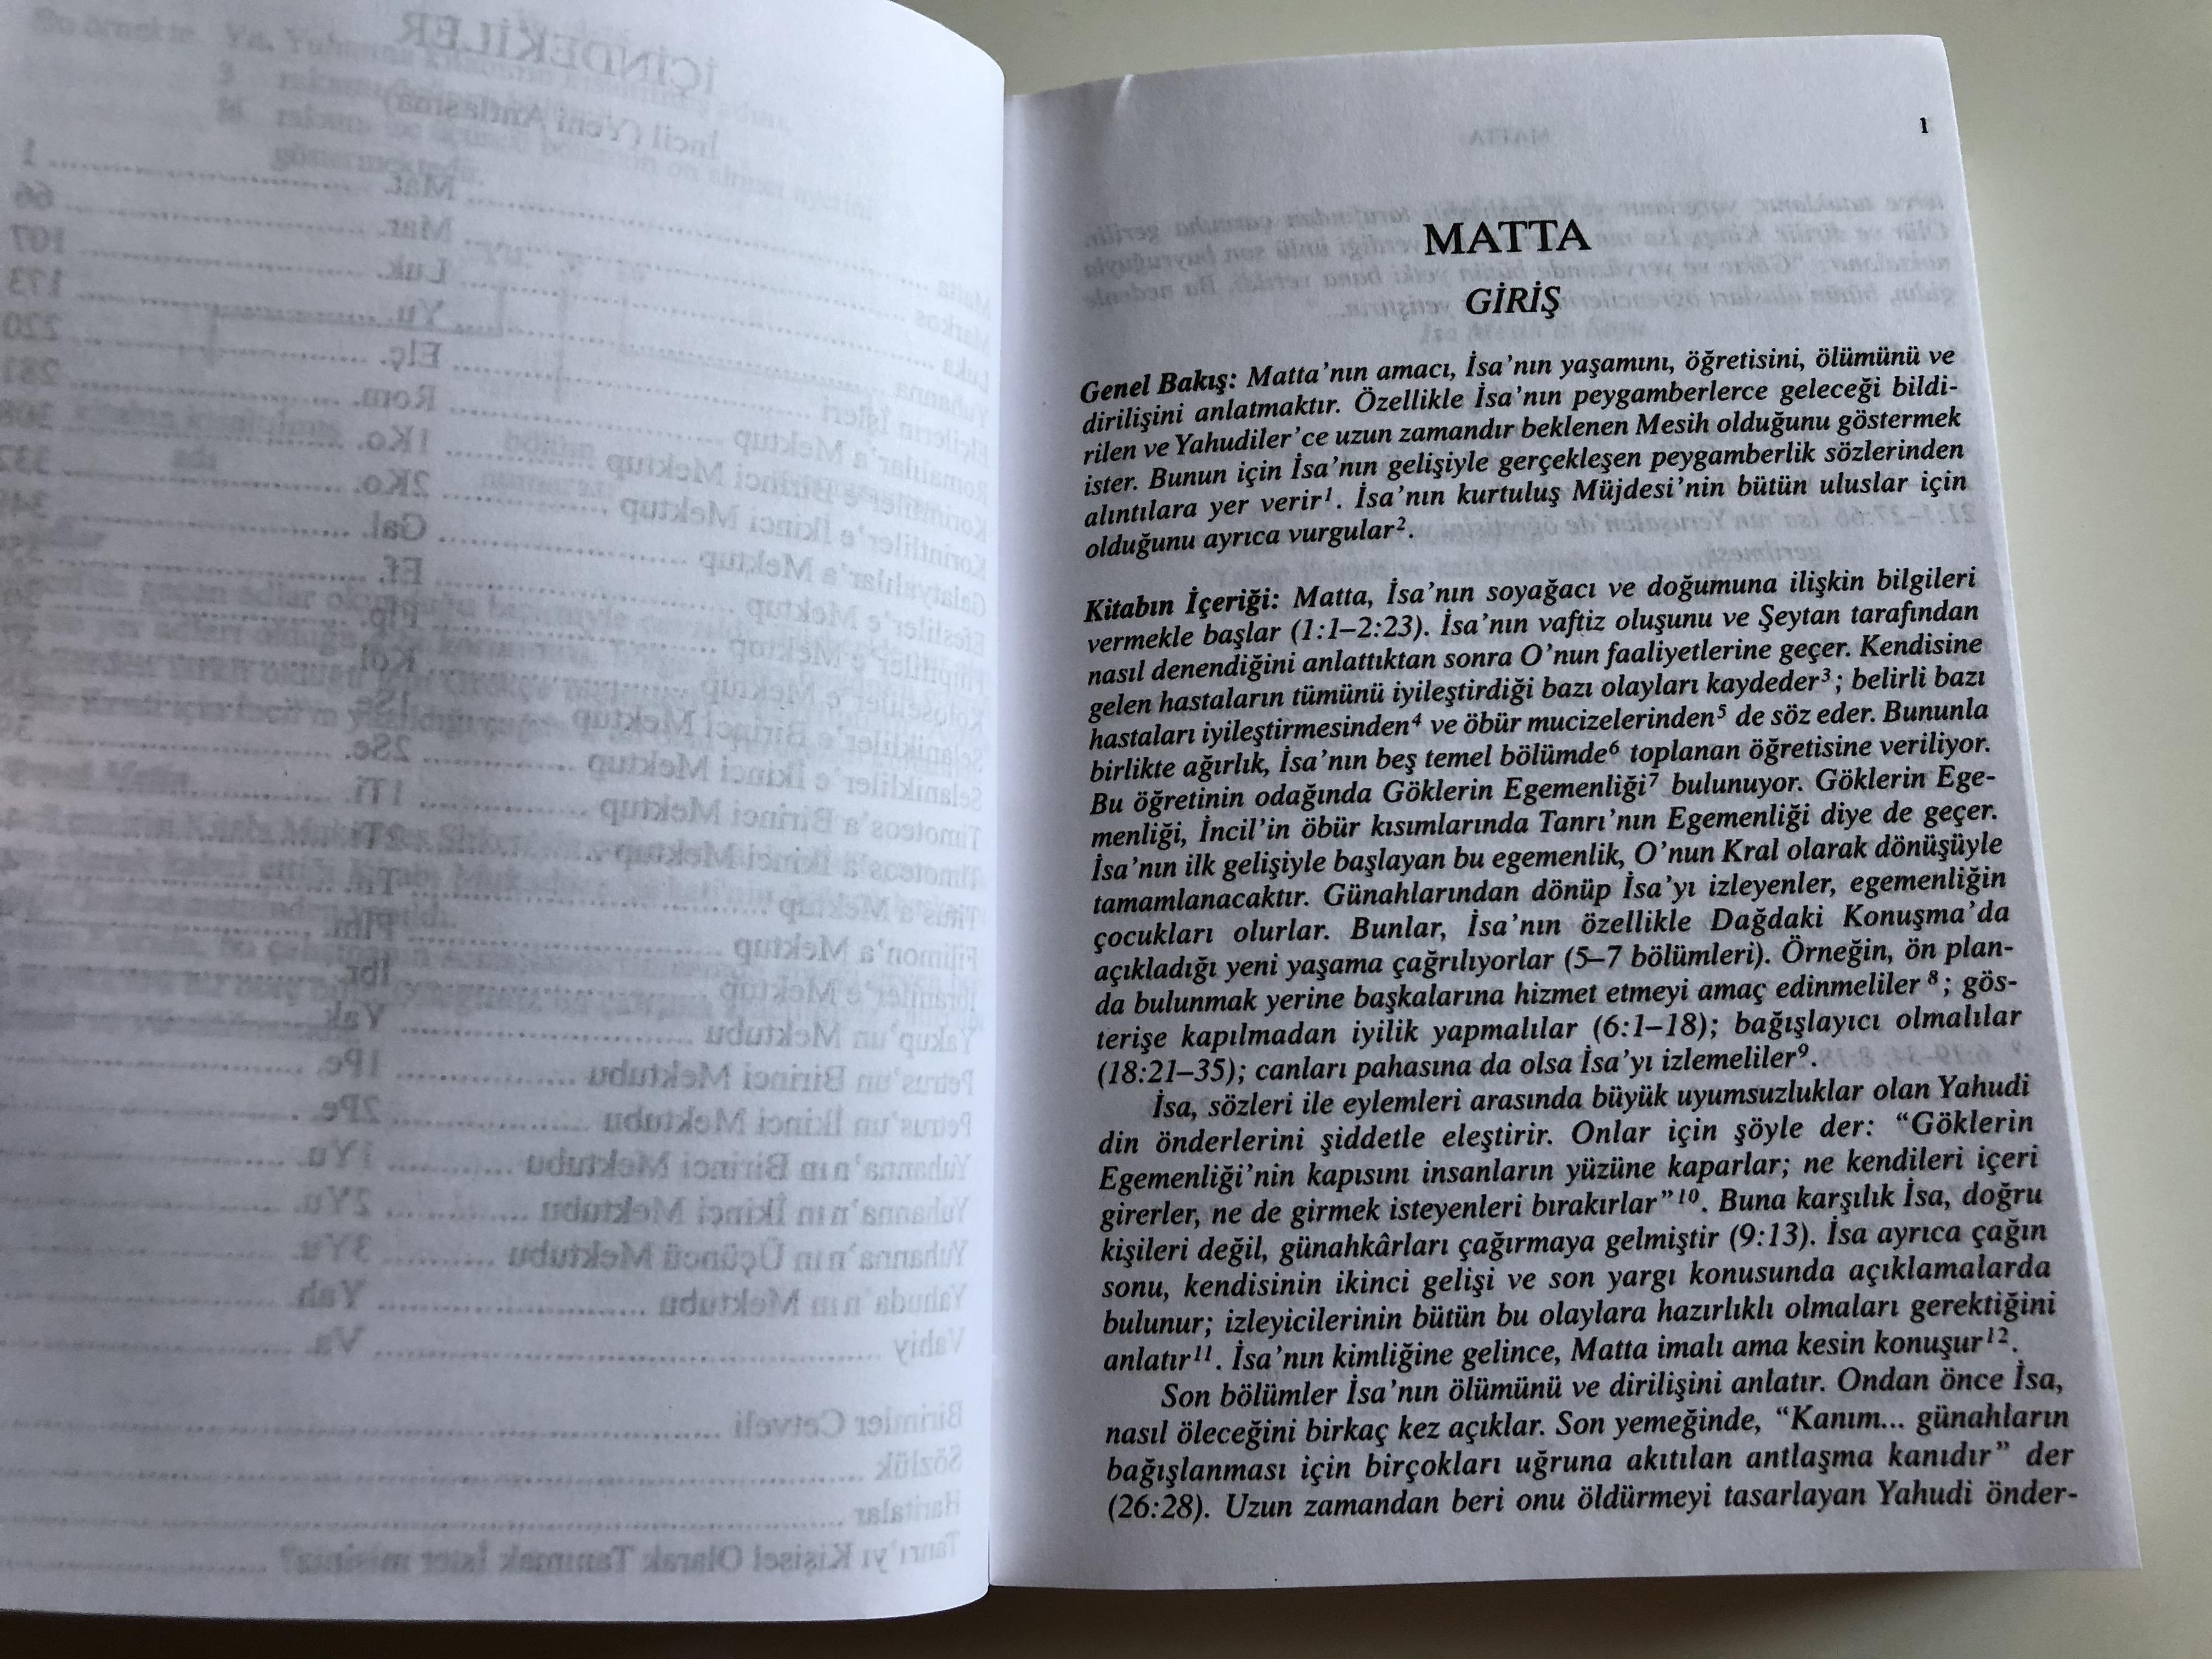 -ncil-m-jde-a-da-t-rk-e-evirisi-turkish-language-new-testament-6-.jpg